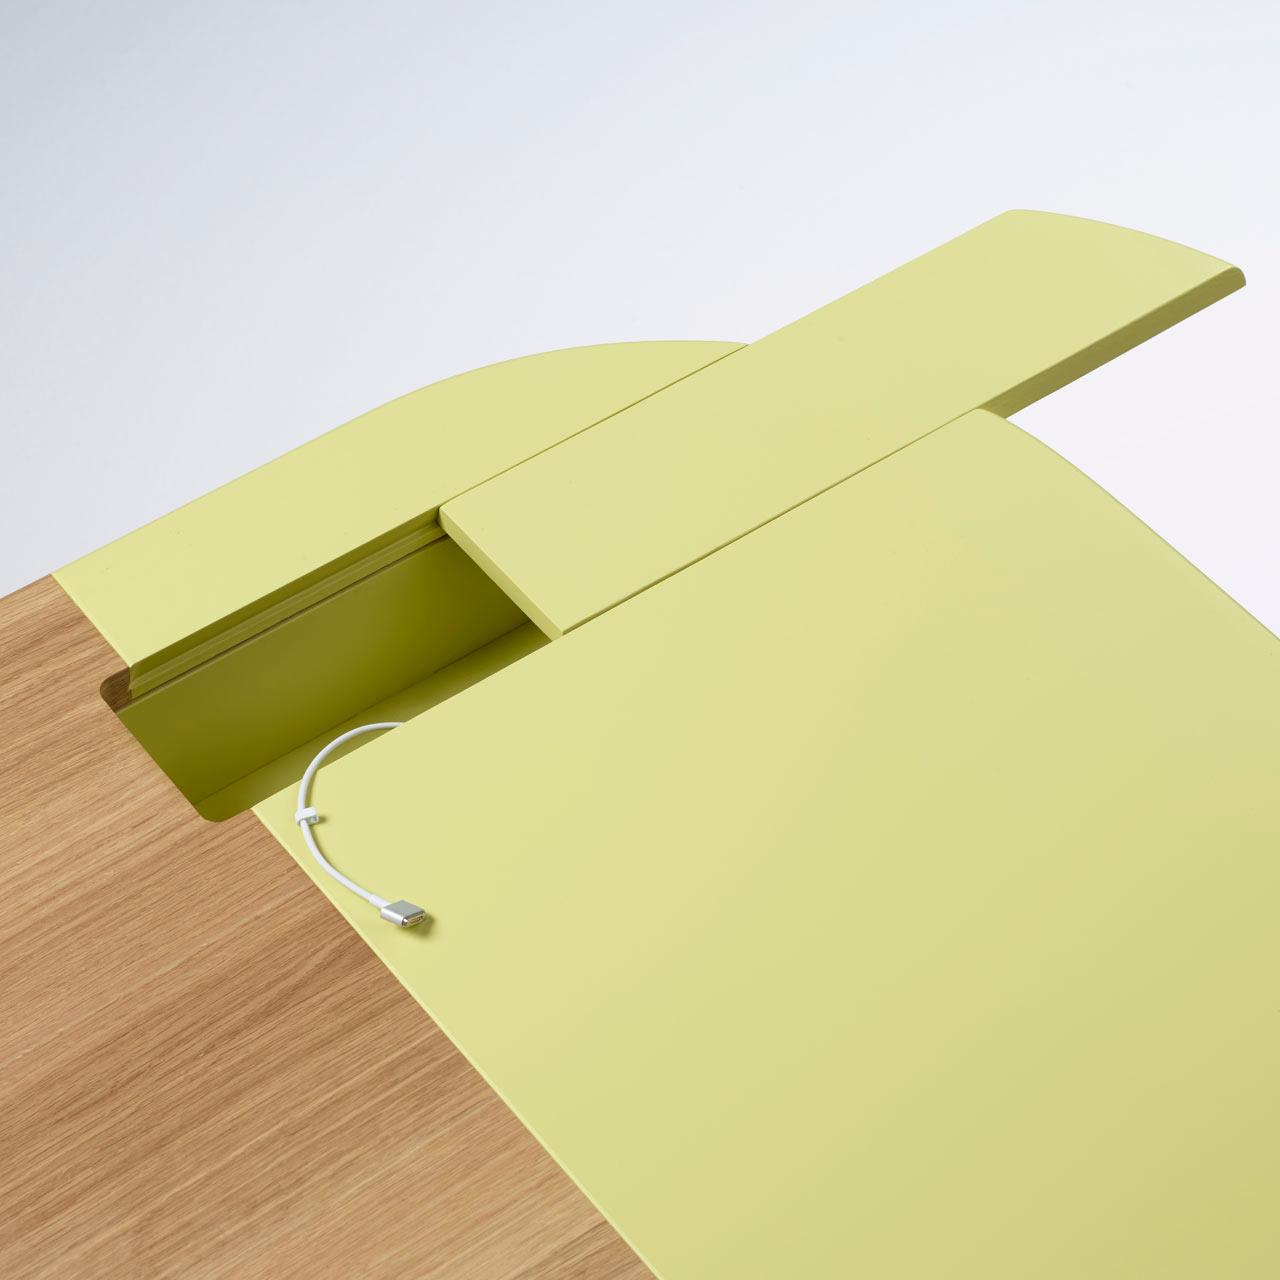 Julie-Gaillard-Latitude-Furniture-hisheji (12)